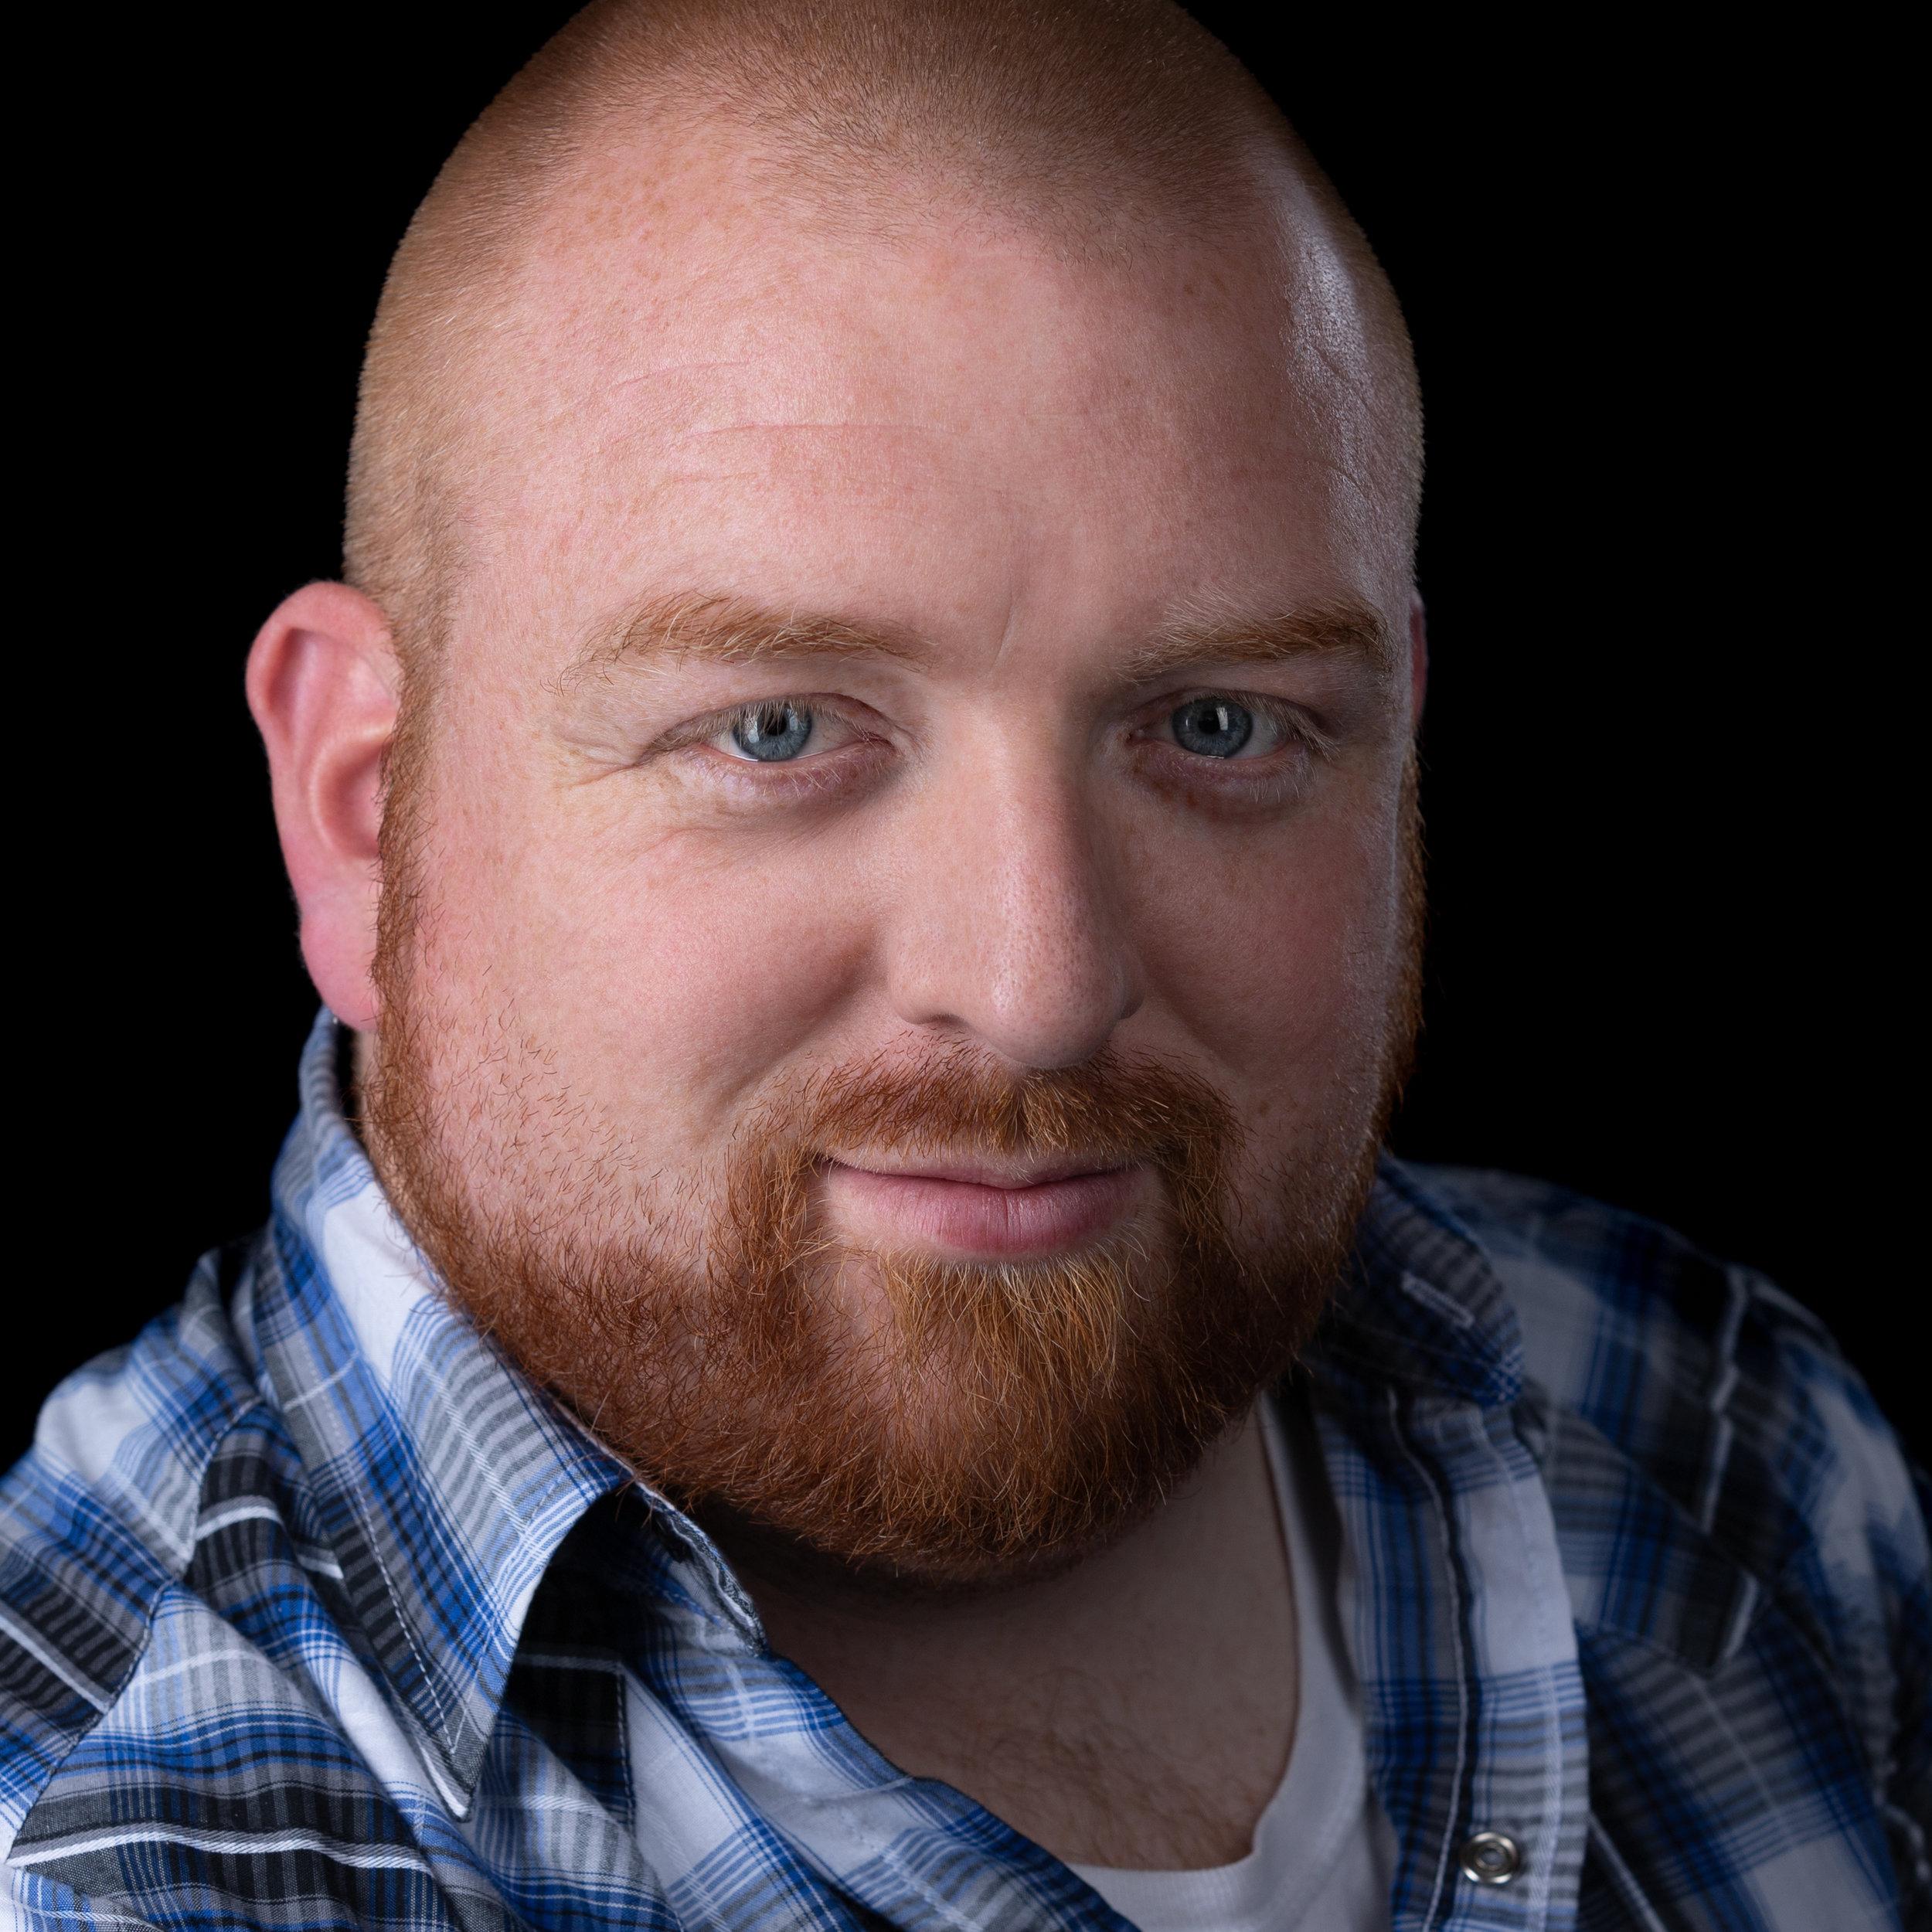 Brian Miner-Rohinni Headshots-859-Edit-3.JPG